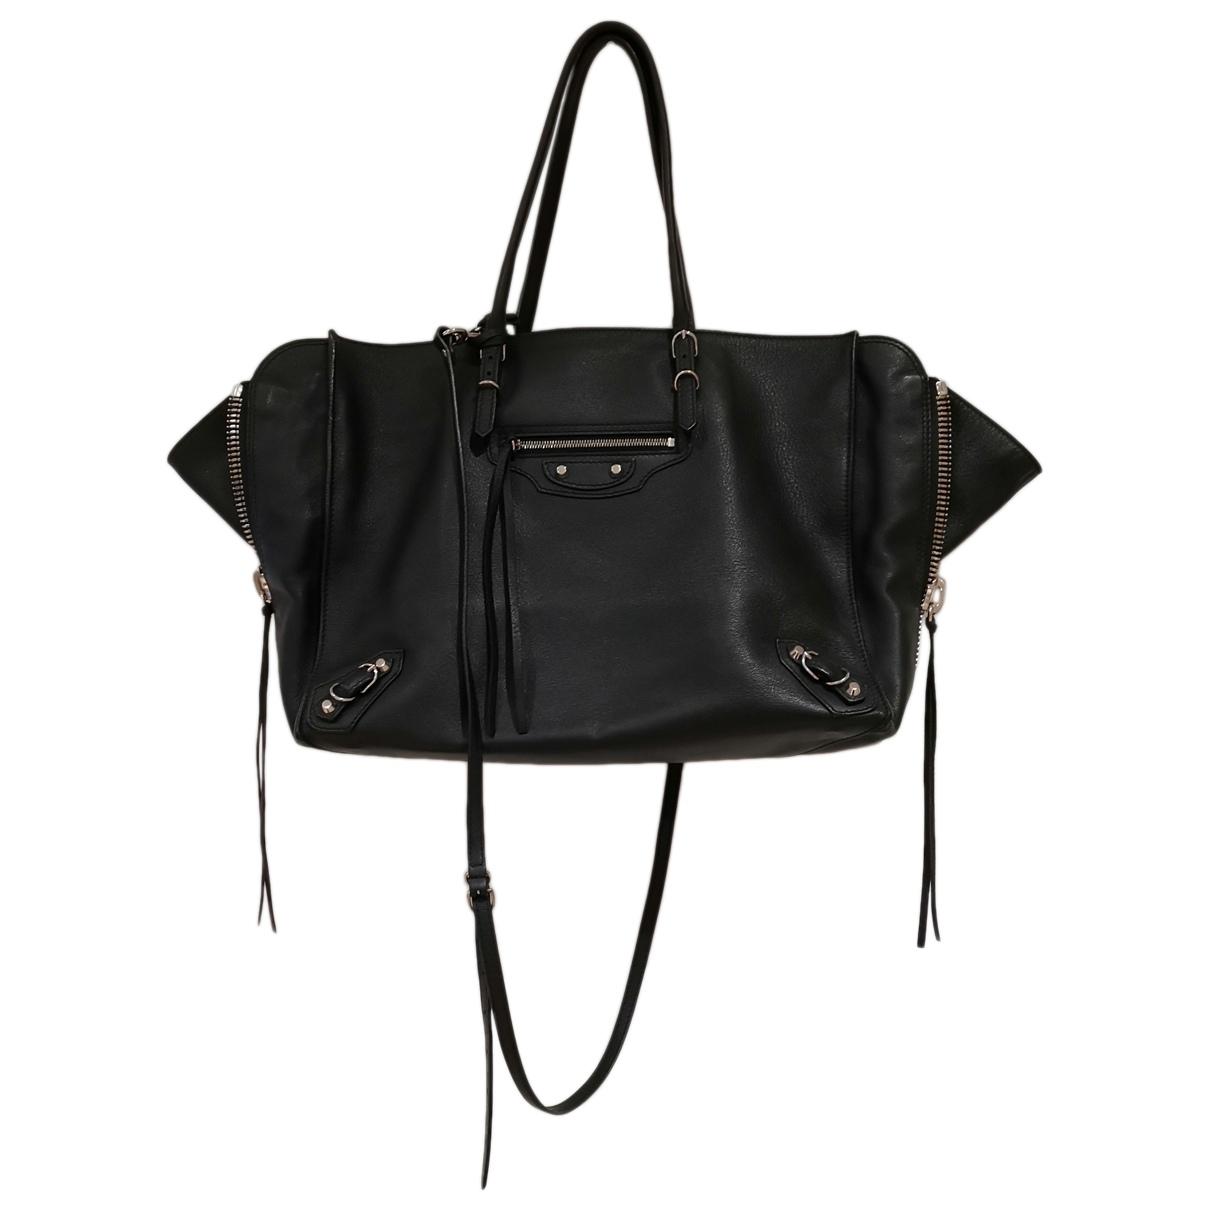 Balenciaga - Sac a main Papier pour femme en cuir - noir